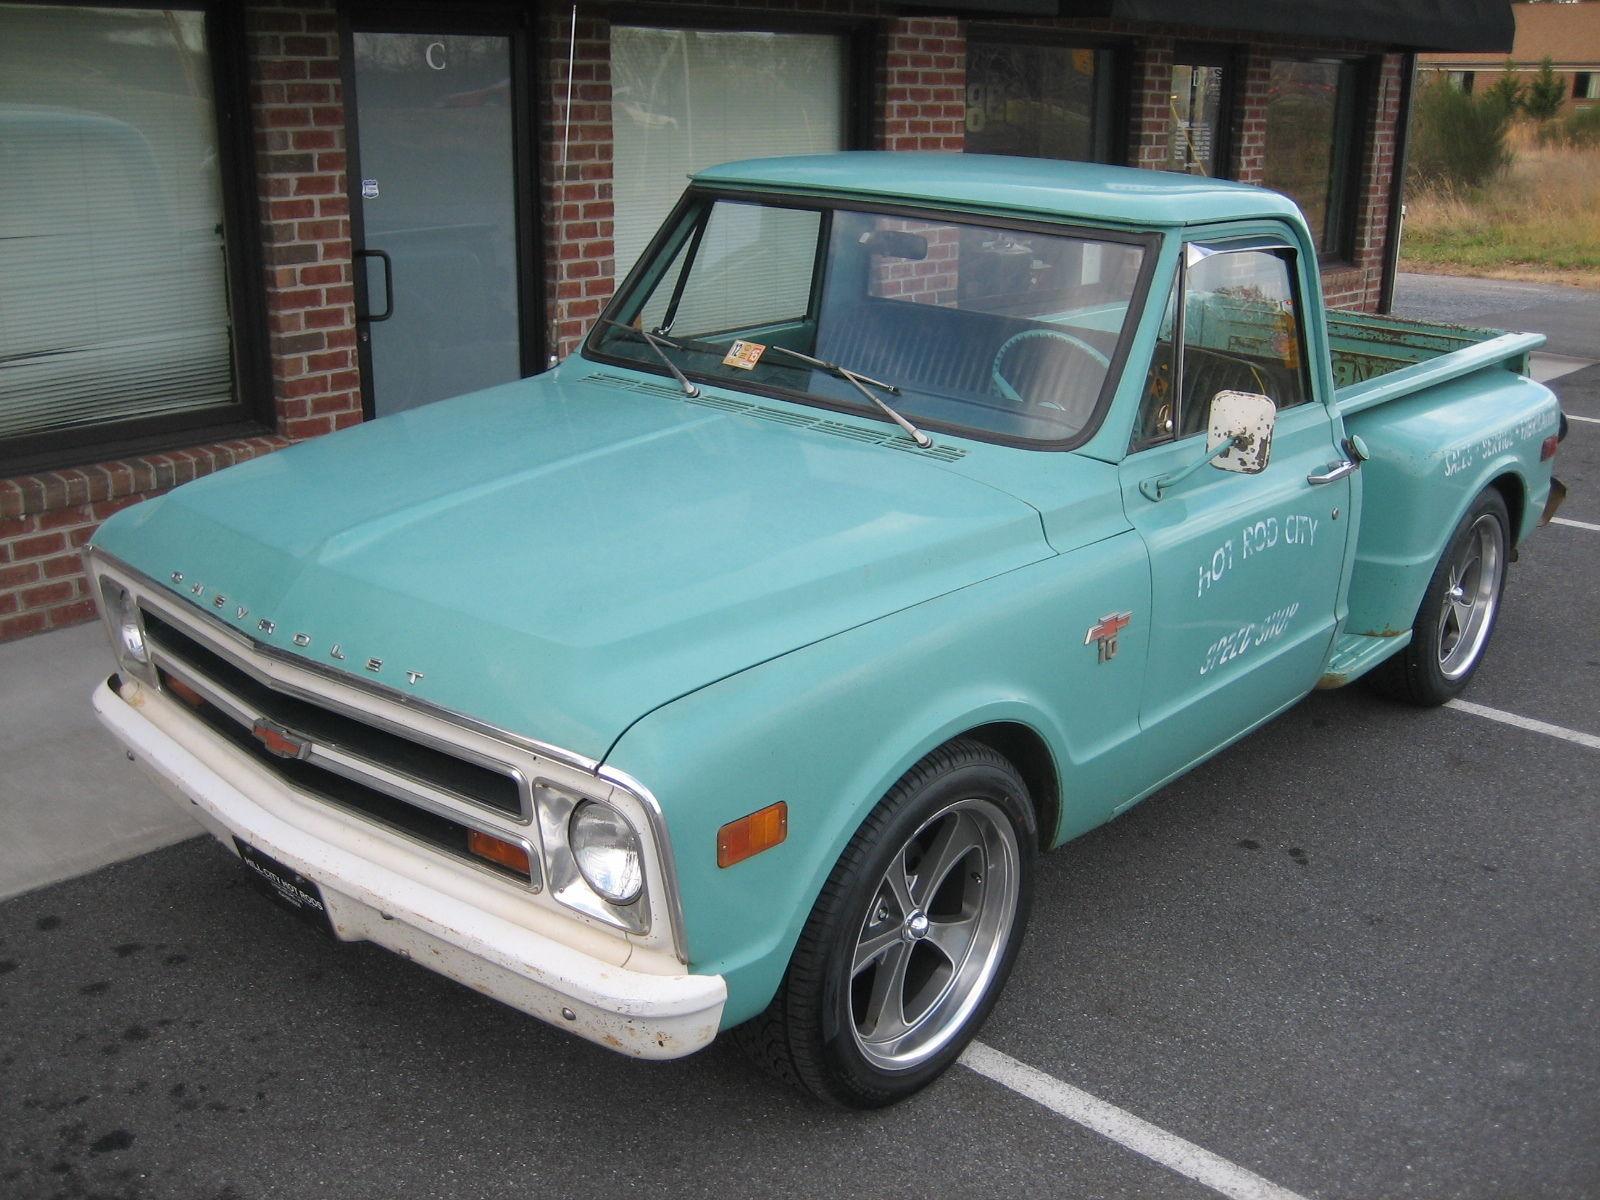 68 Chevy Patina Slammed Touring Rat Hot Rod Shop Truck Pickup 86k Original Miles